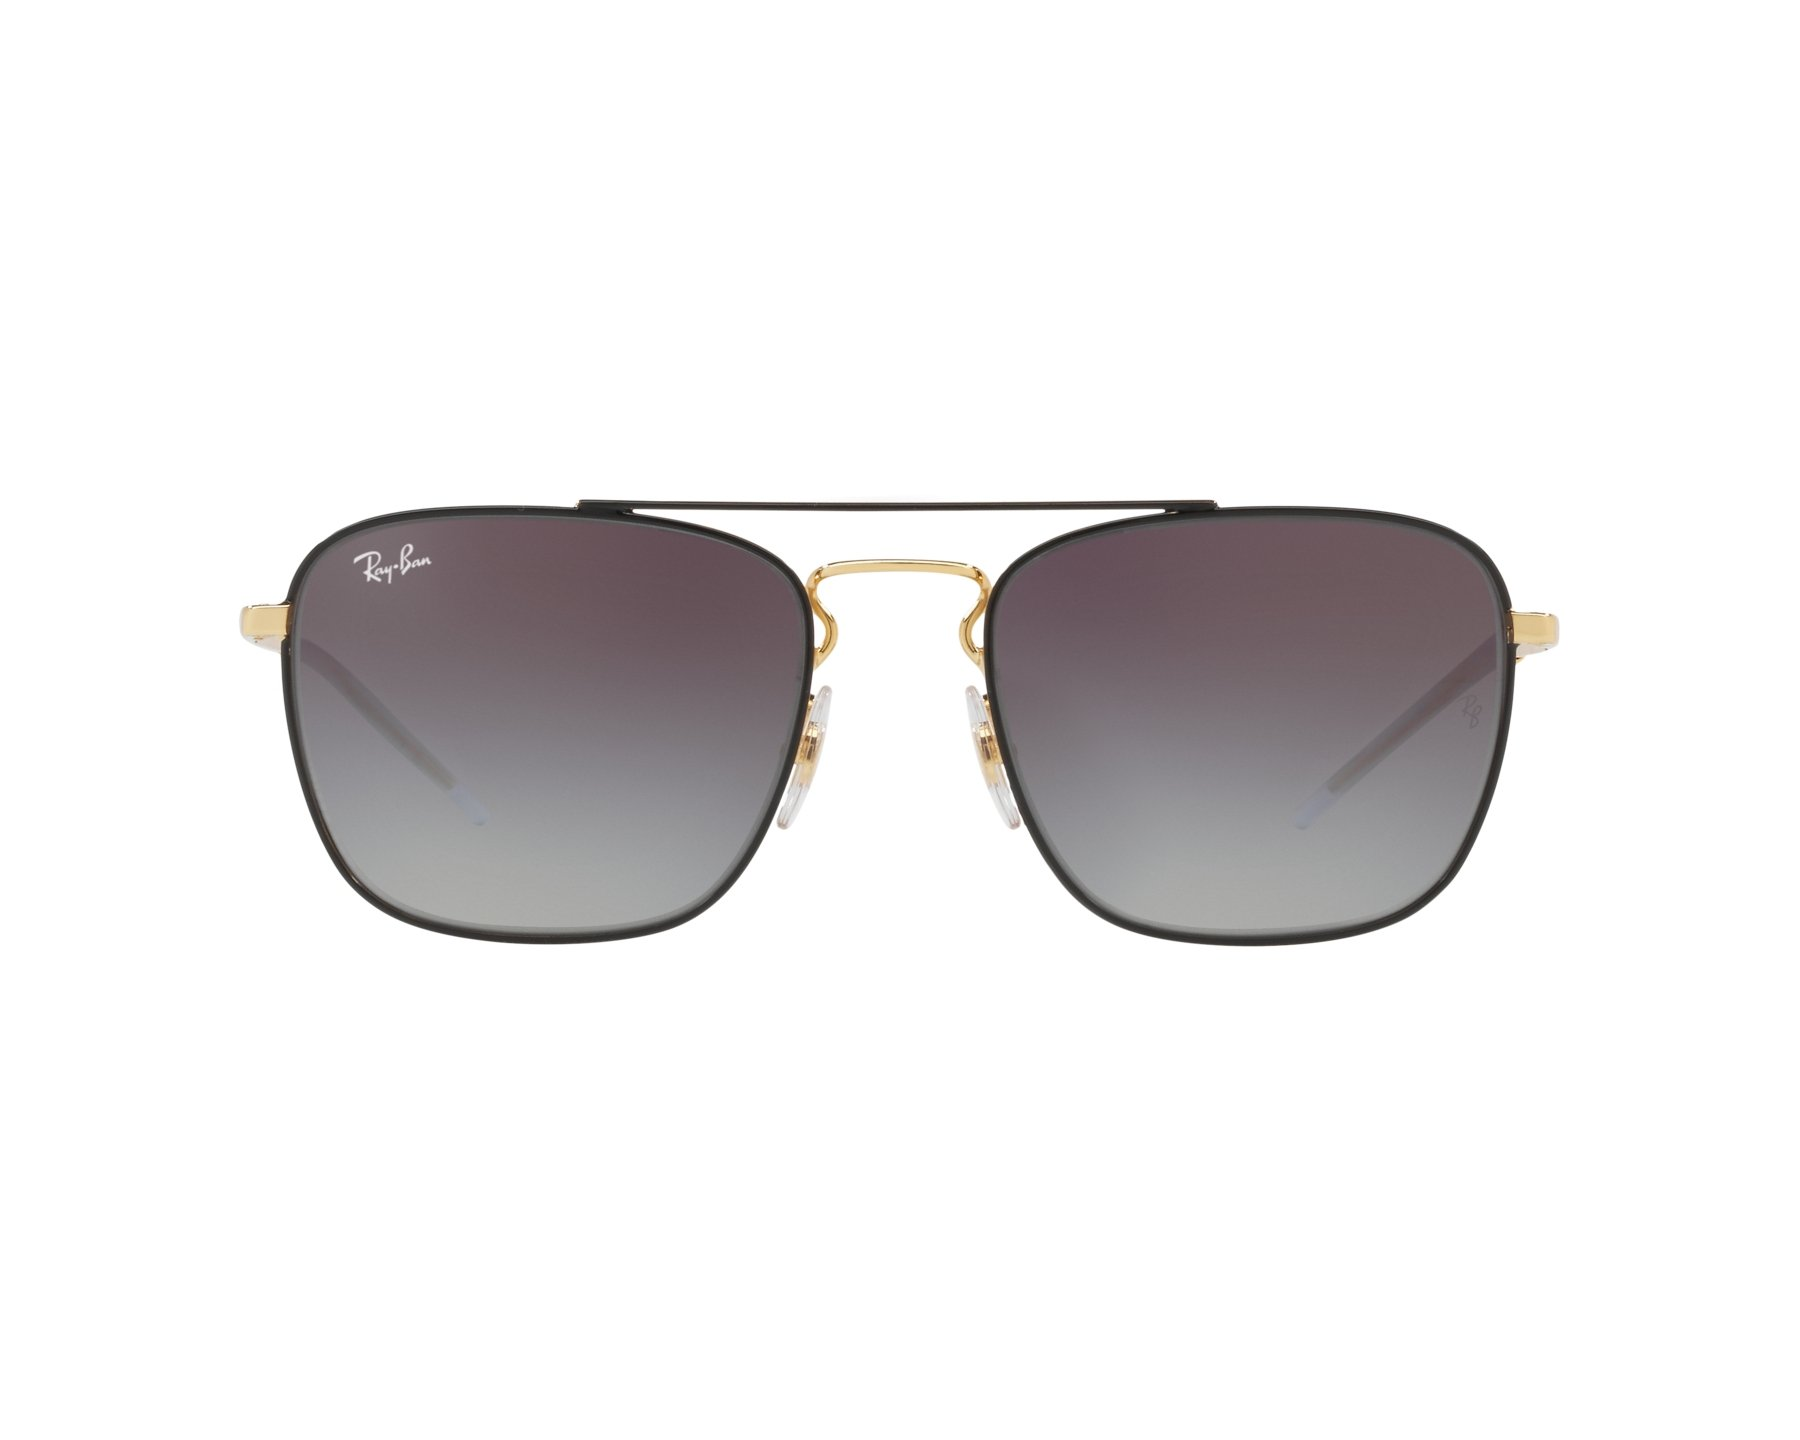 148a5e550dc Sunglasses Ray-Ban RB-3588 90548G 55-19 Black Gold 360 degree view